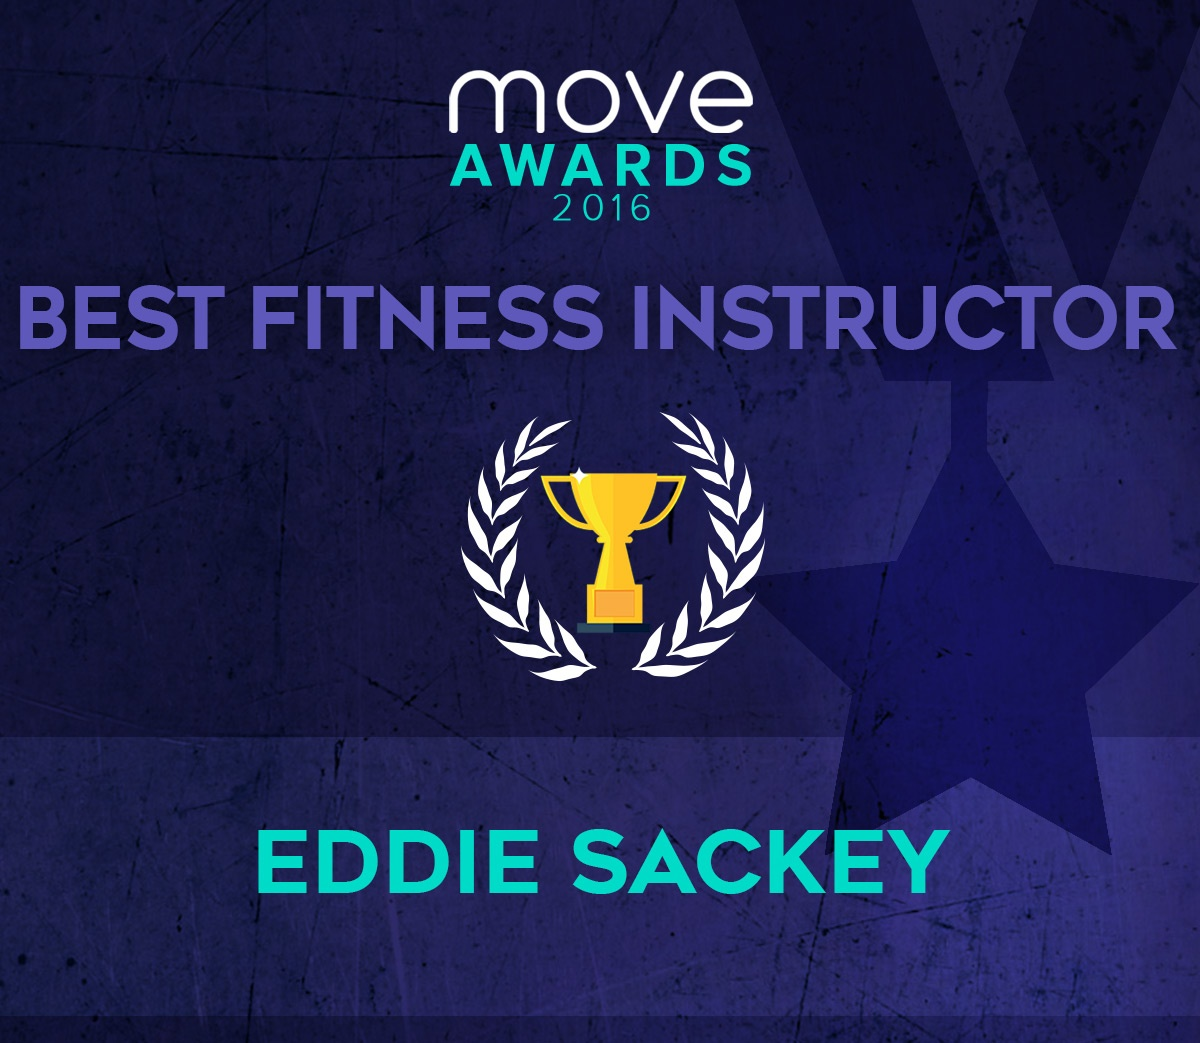 Best-Fitness-Instructor-Manchester.jpg